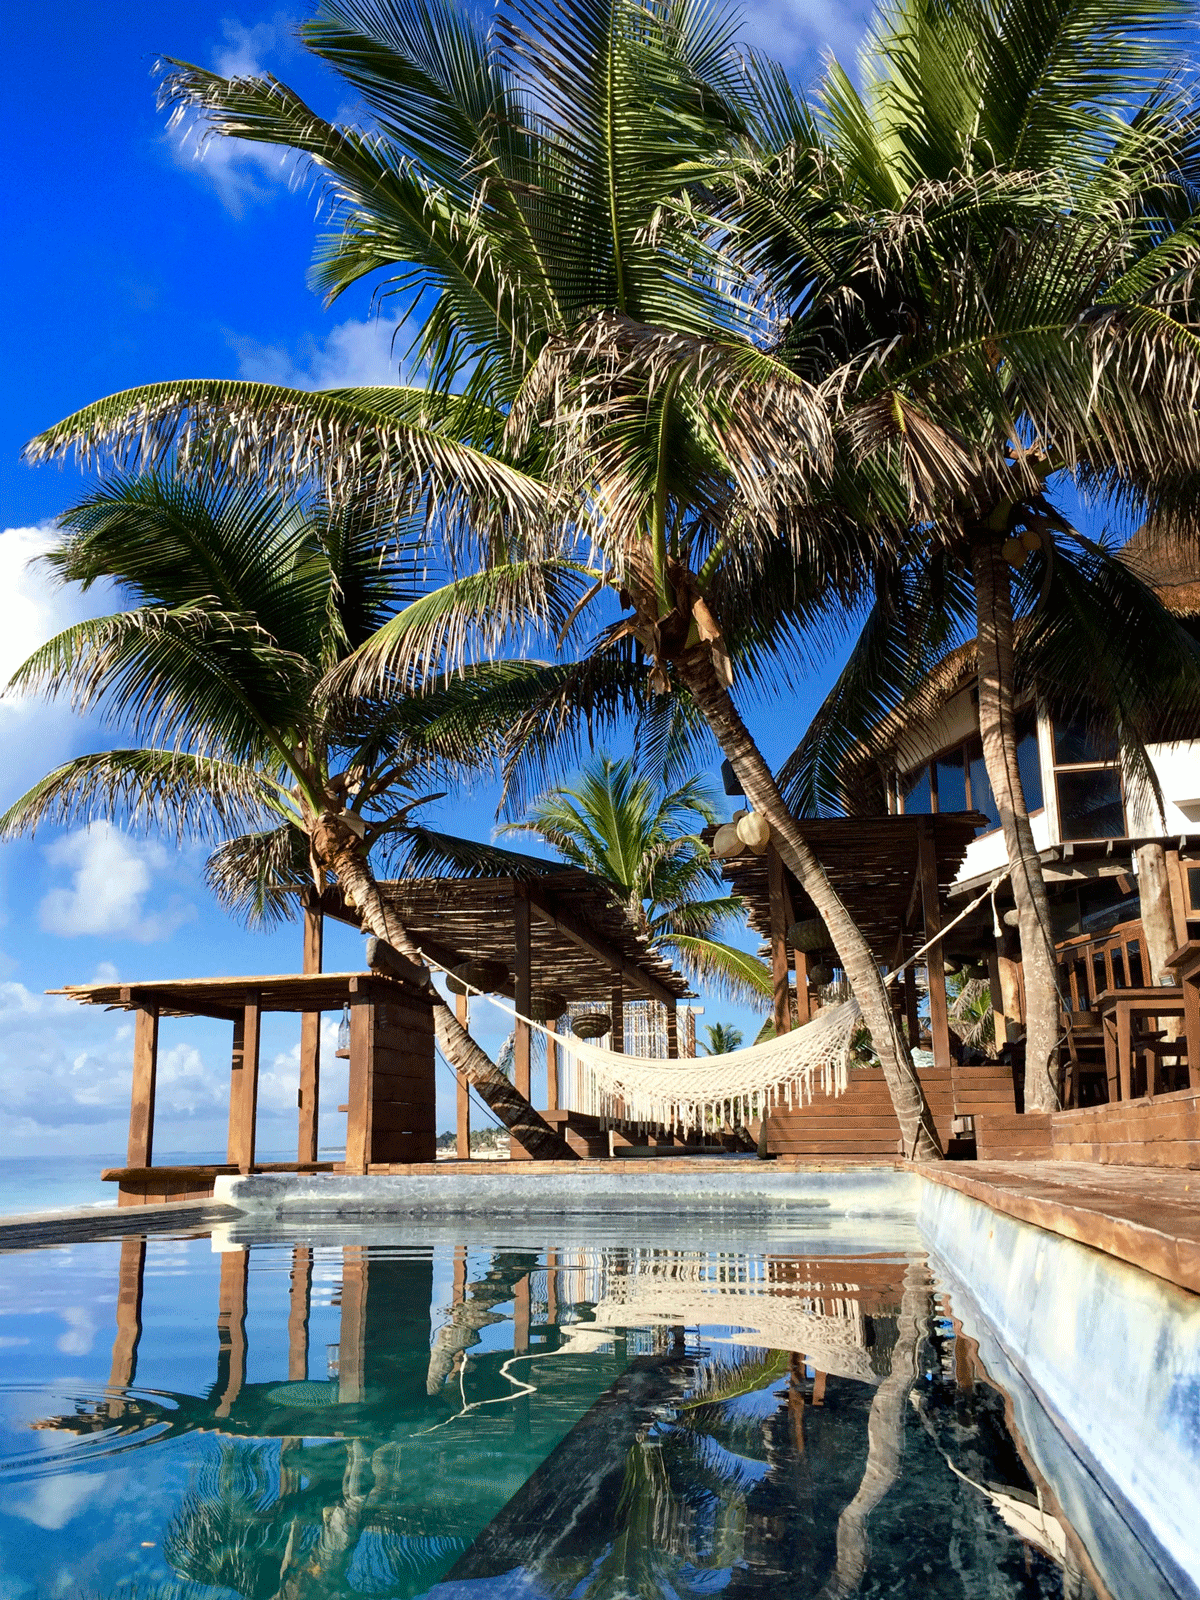 amansala-tulum-mexico-wellness-resort-28.png